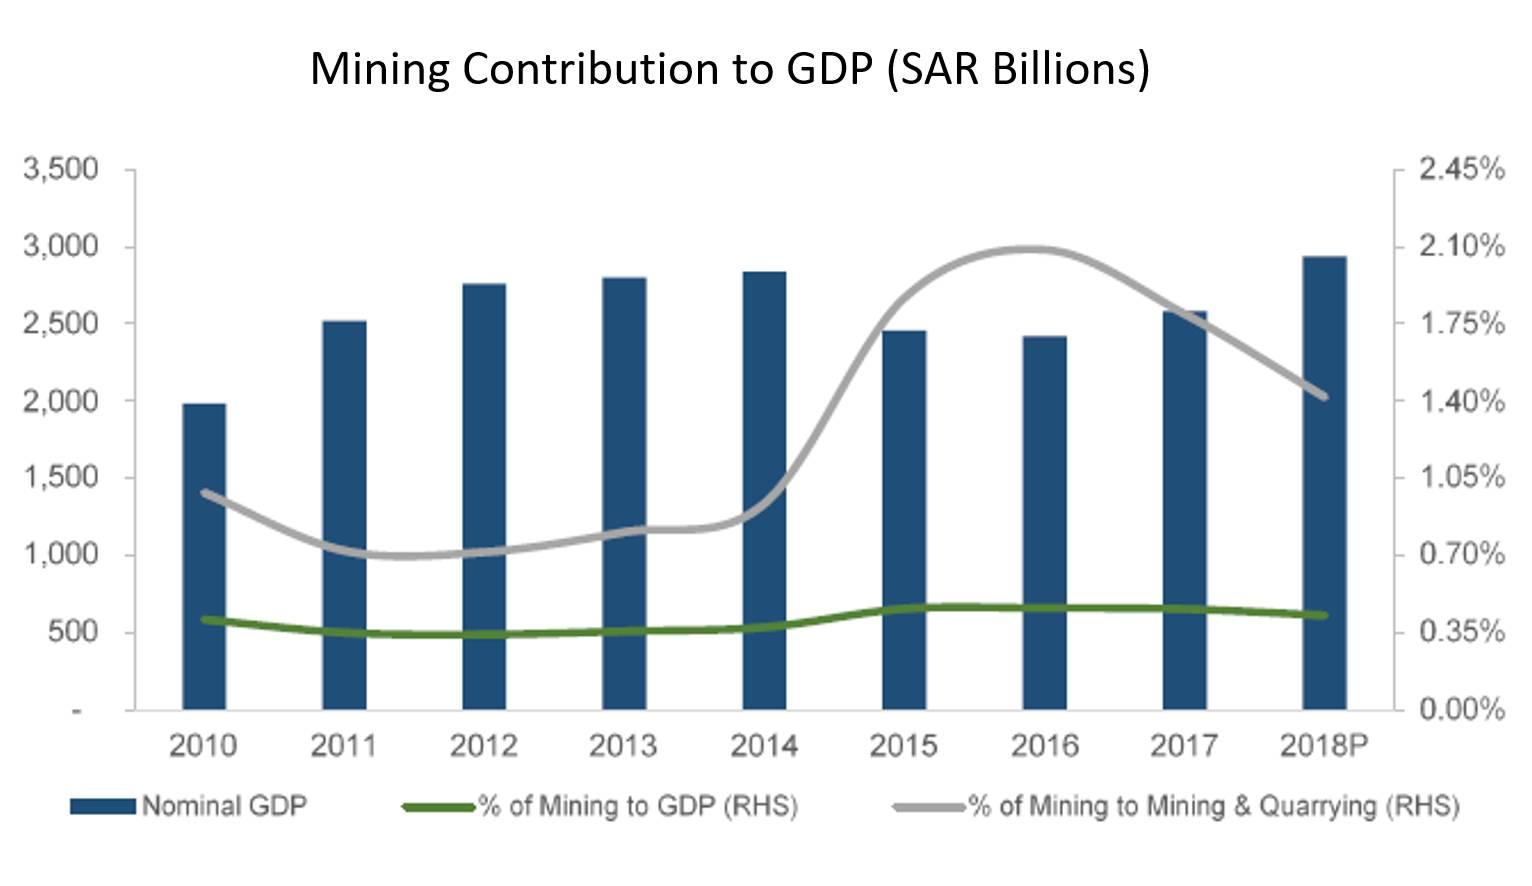 Mining Contribution to GDP (SAR Billions)